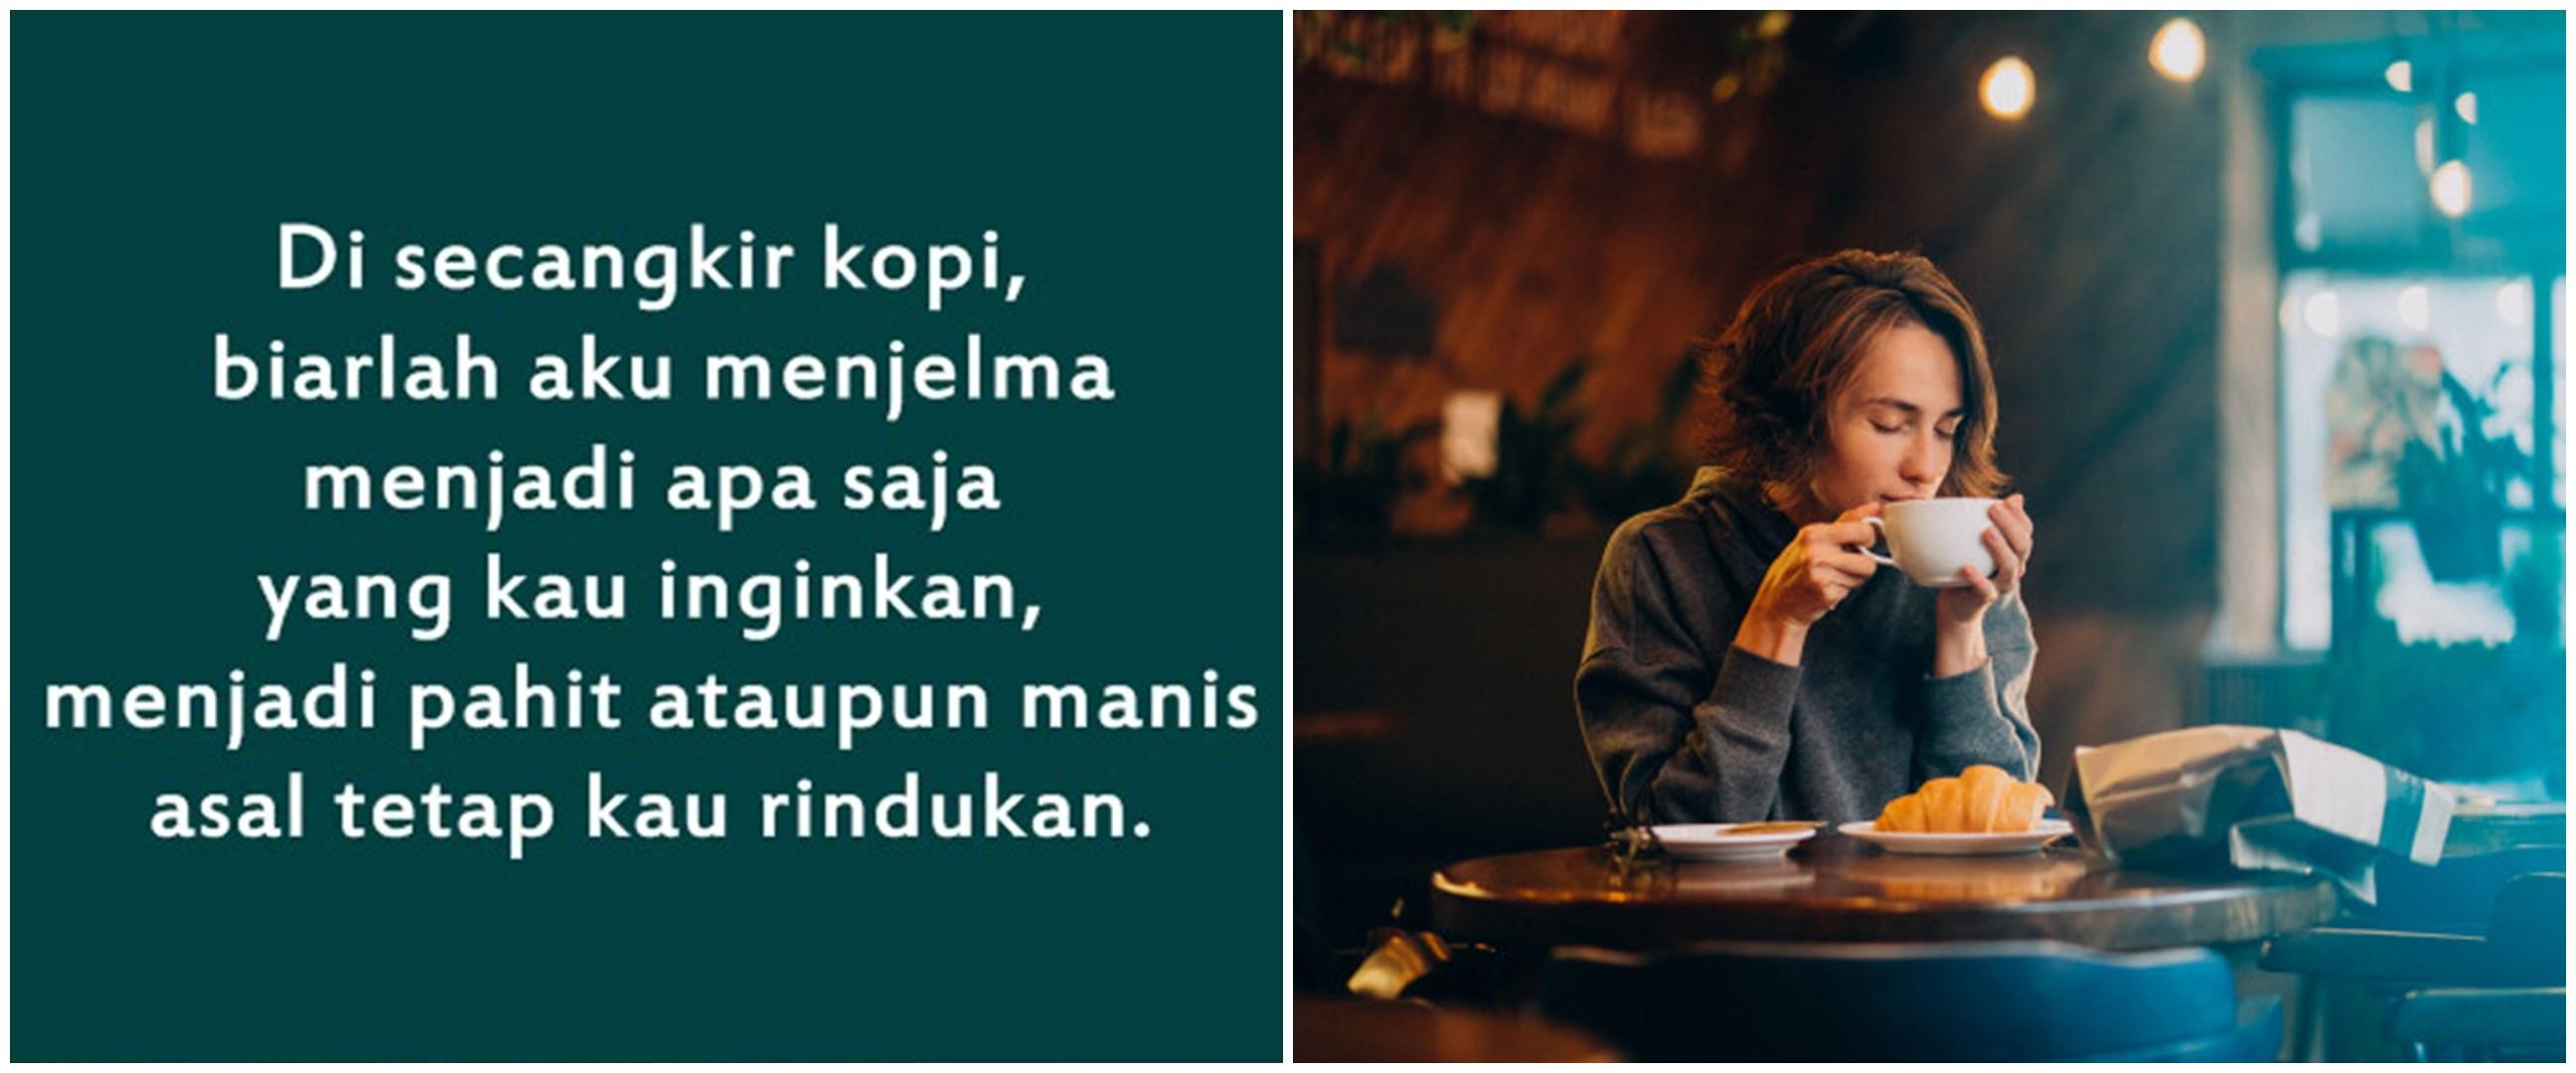 50 Kata-kata caption indie tentang kopi, penuh makna filosofis